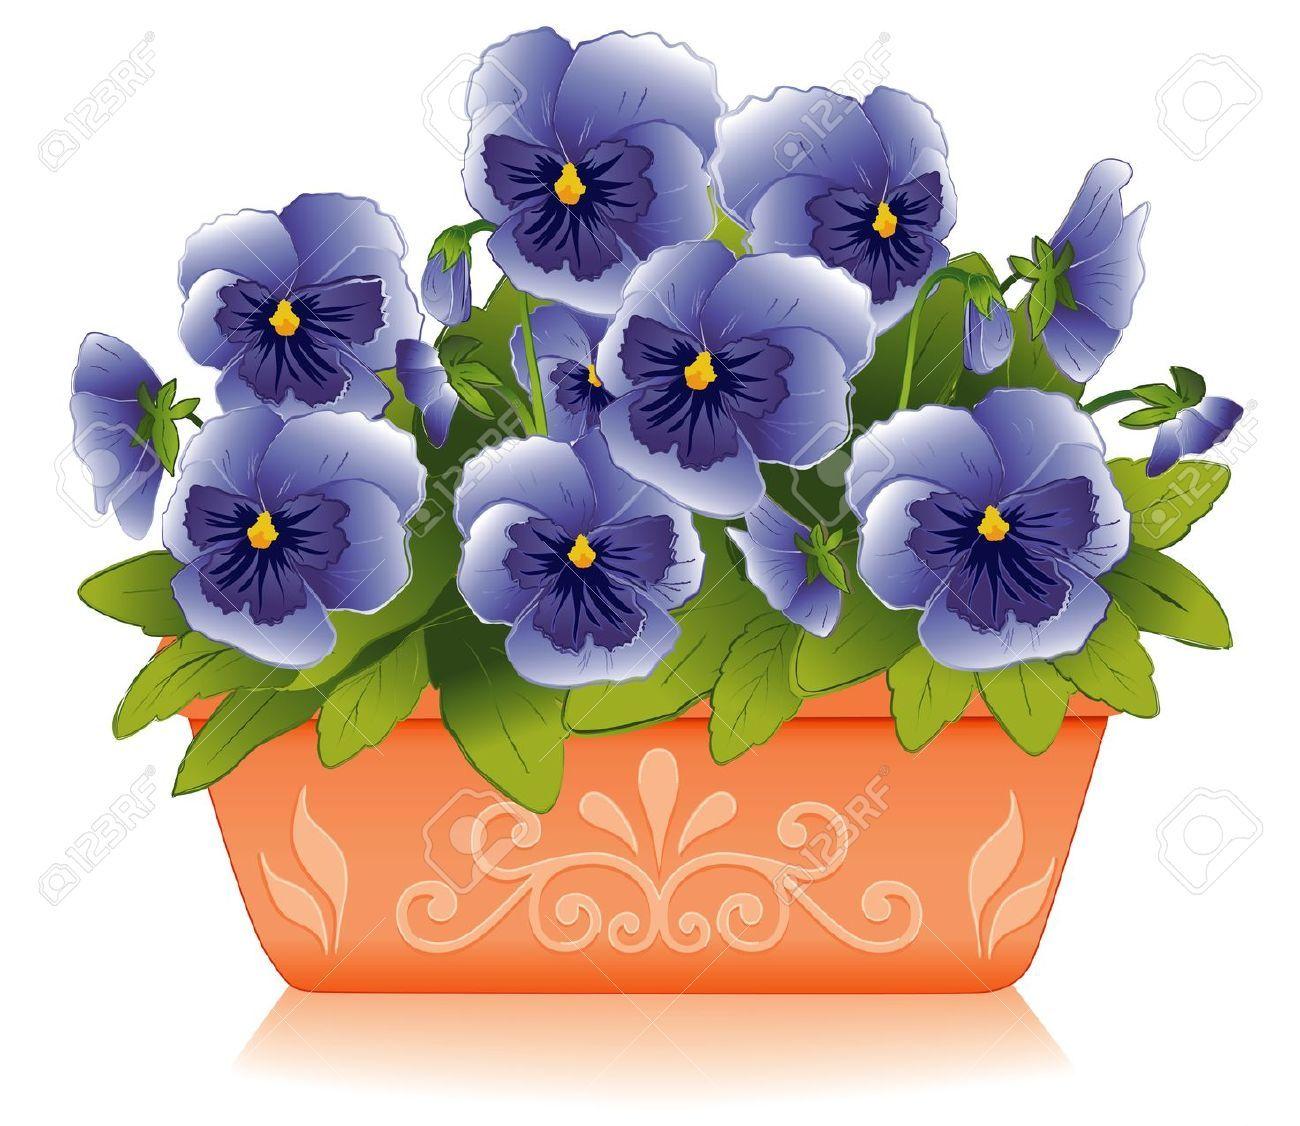 Resultado de imagen para macetas con flores animadas for Macetas rectangulares grandes